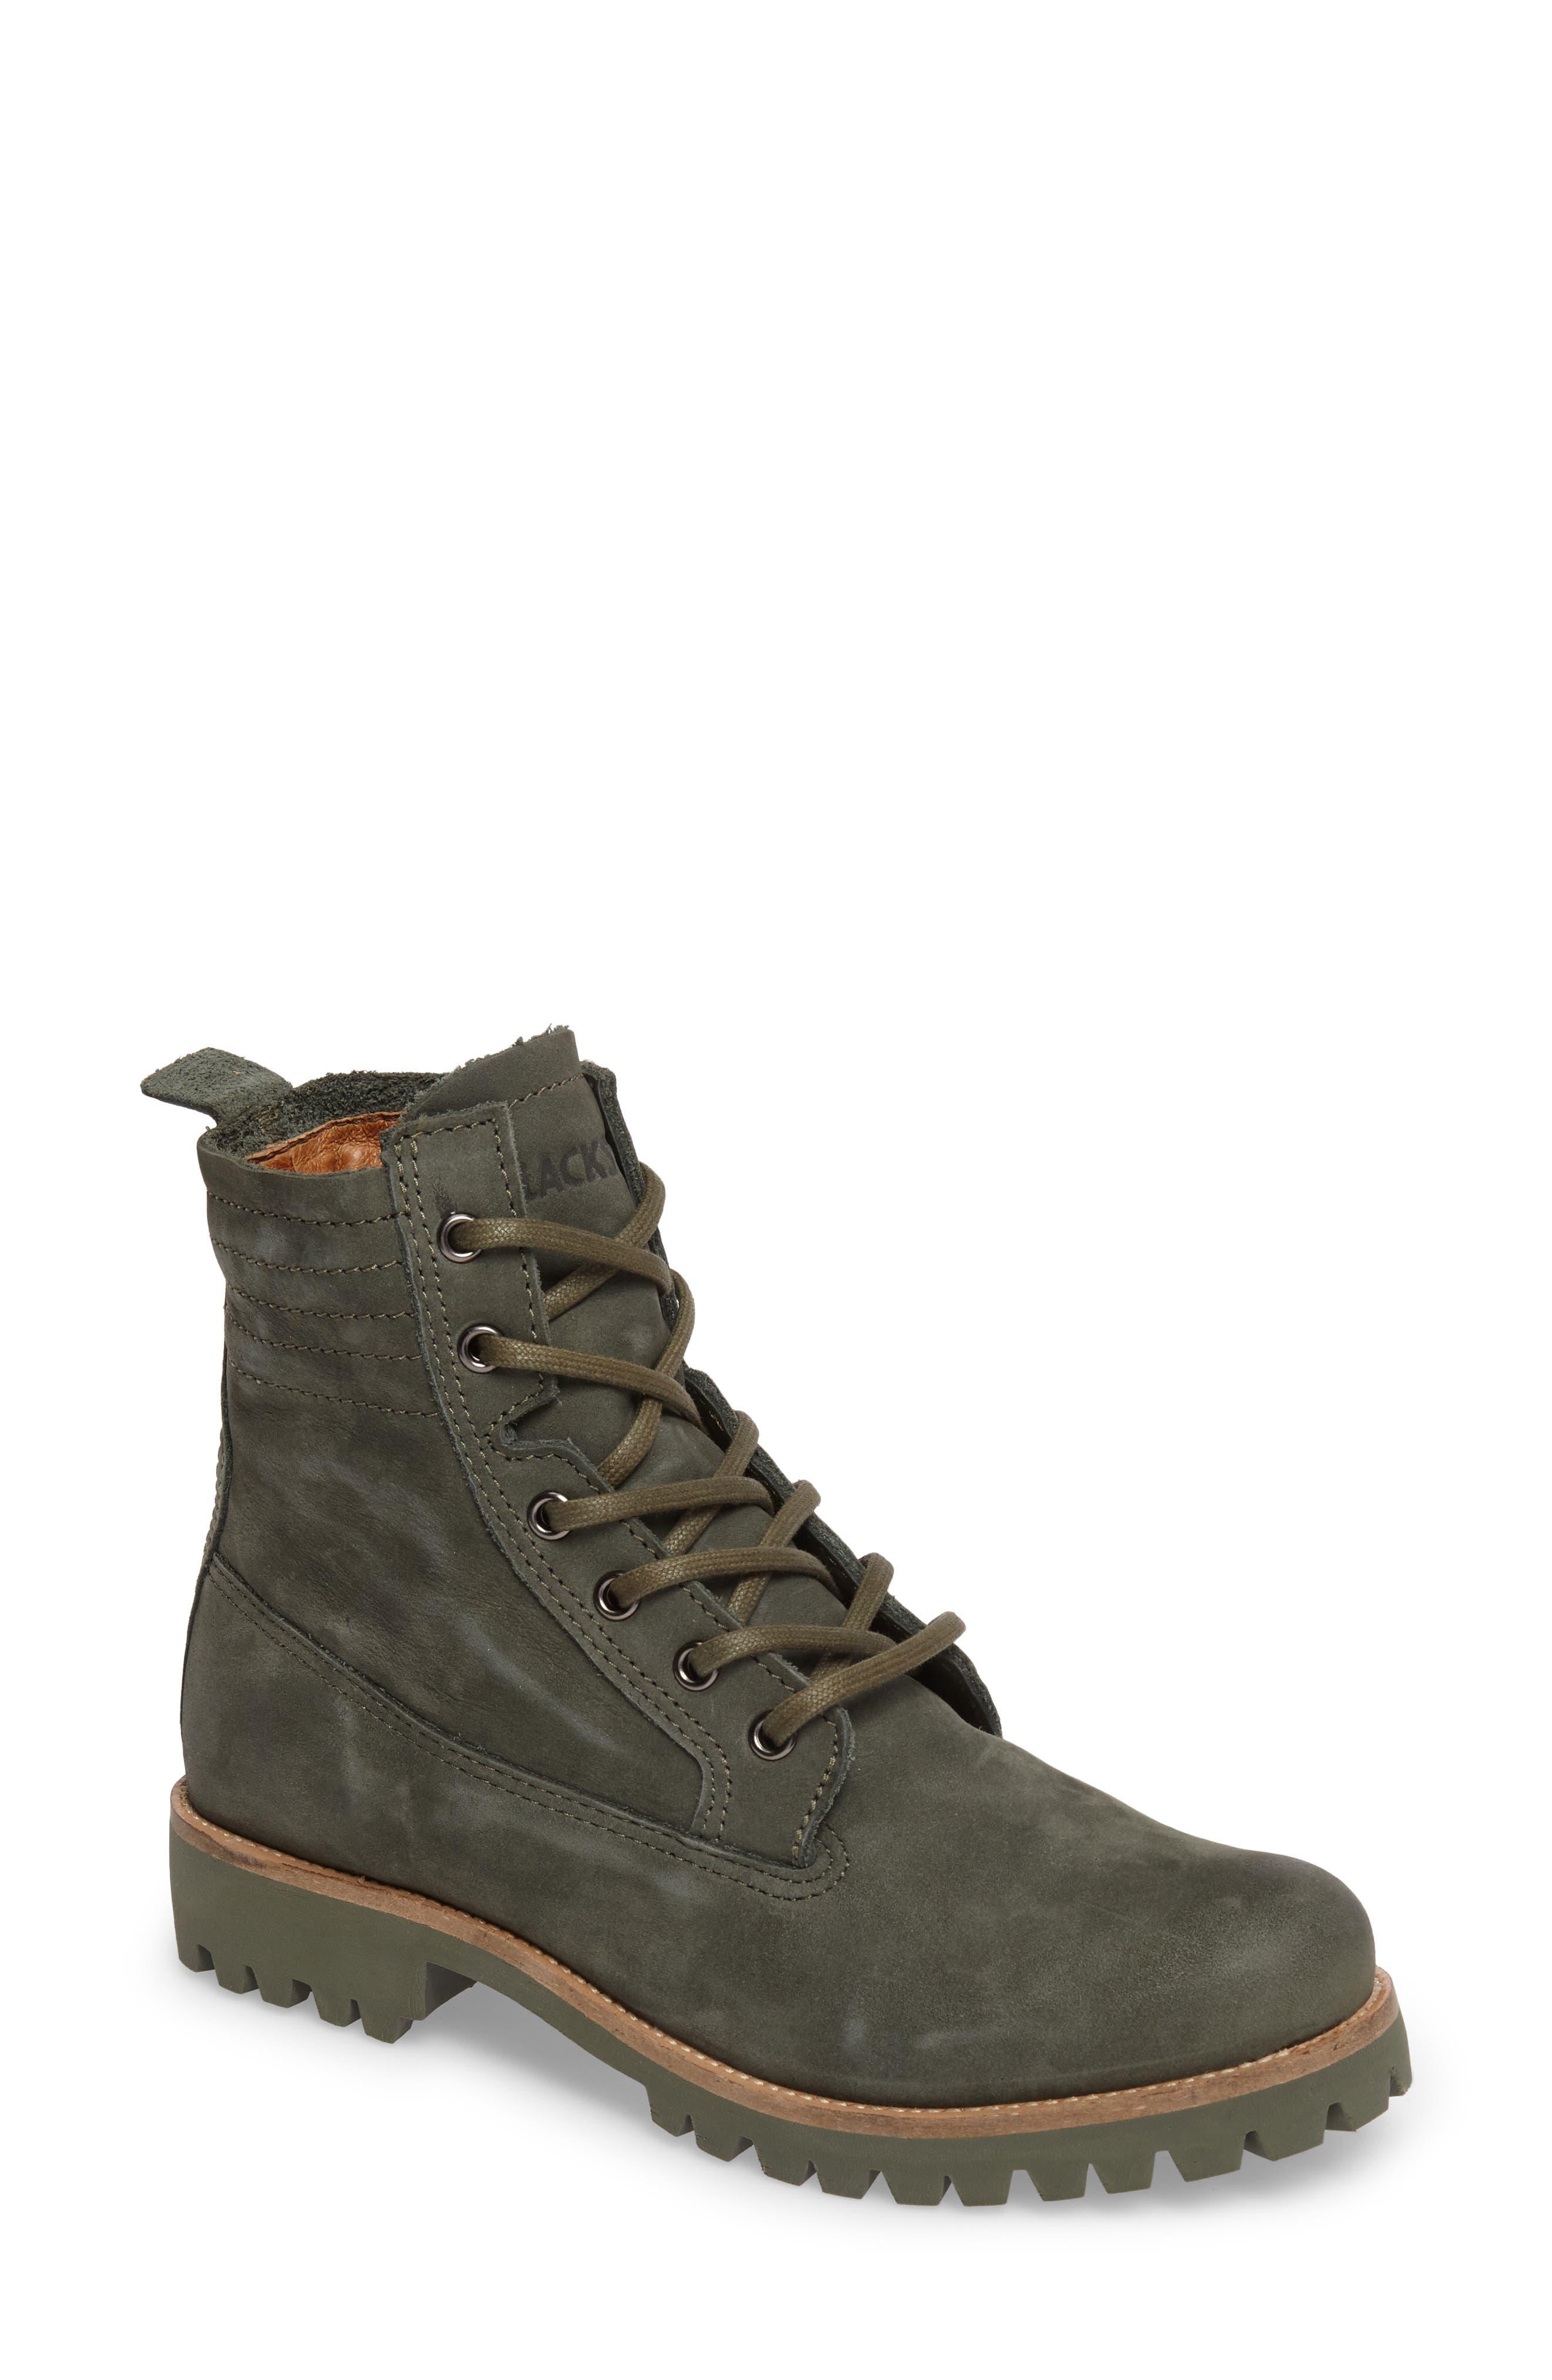 OL23 Lace-Up Boot,                         Main,                         color, Dark Green Nubuck